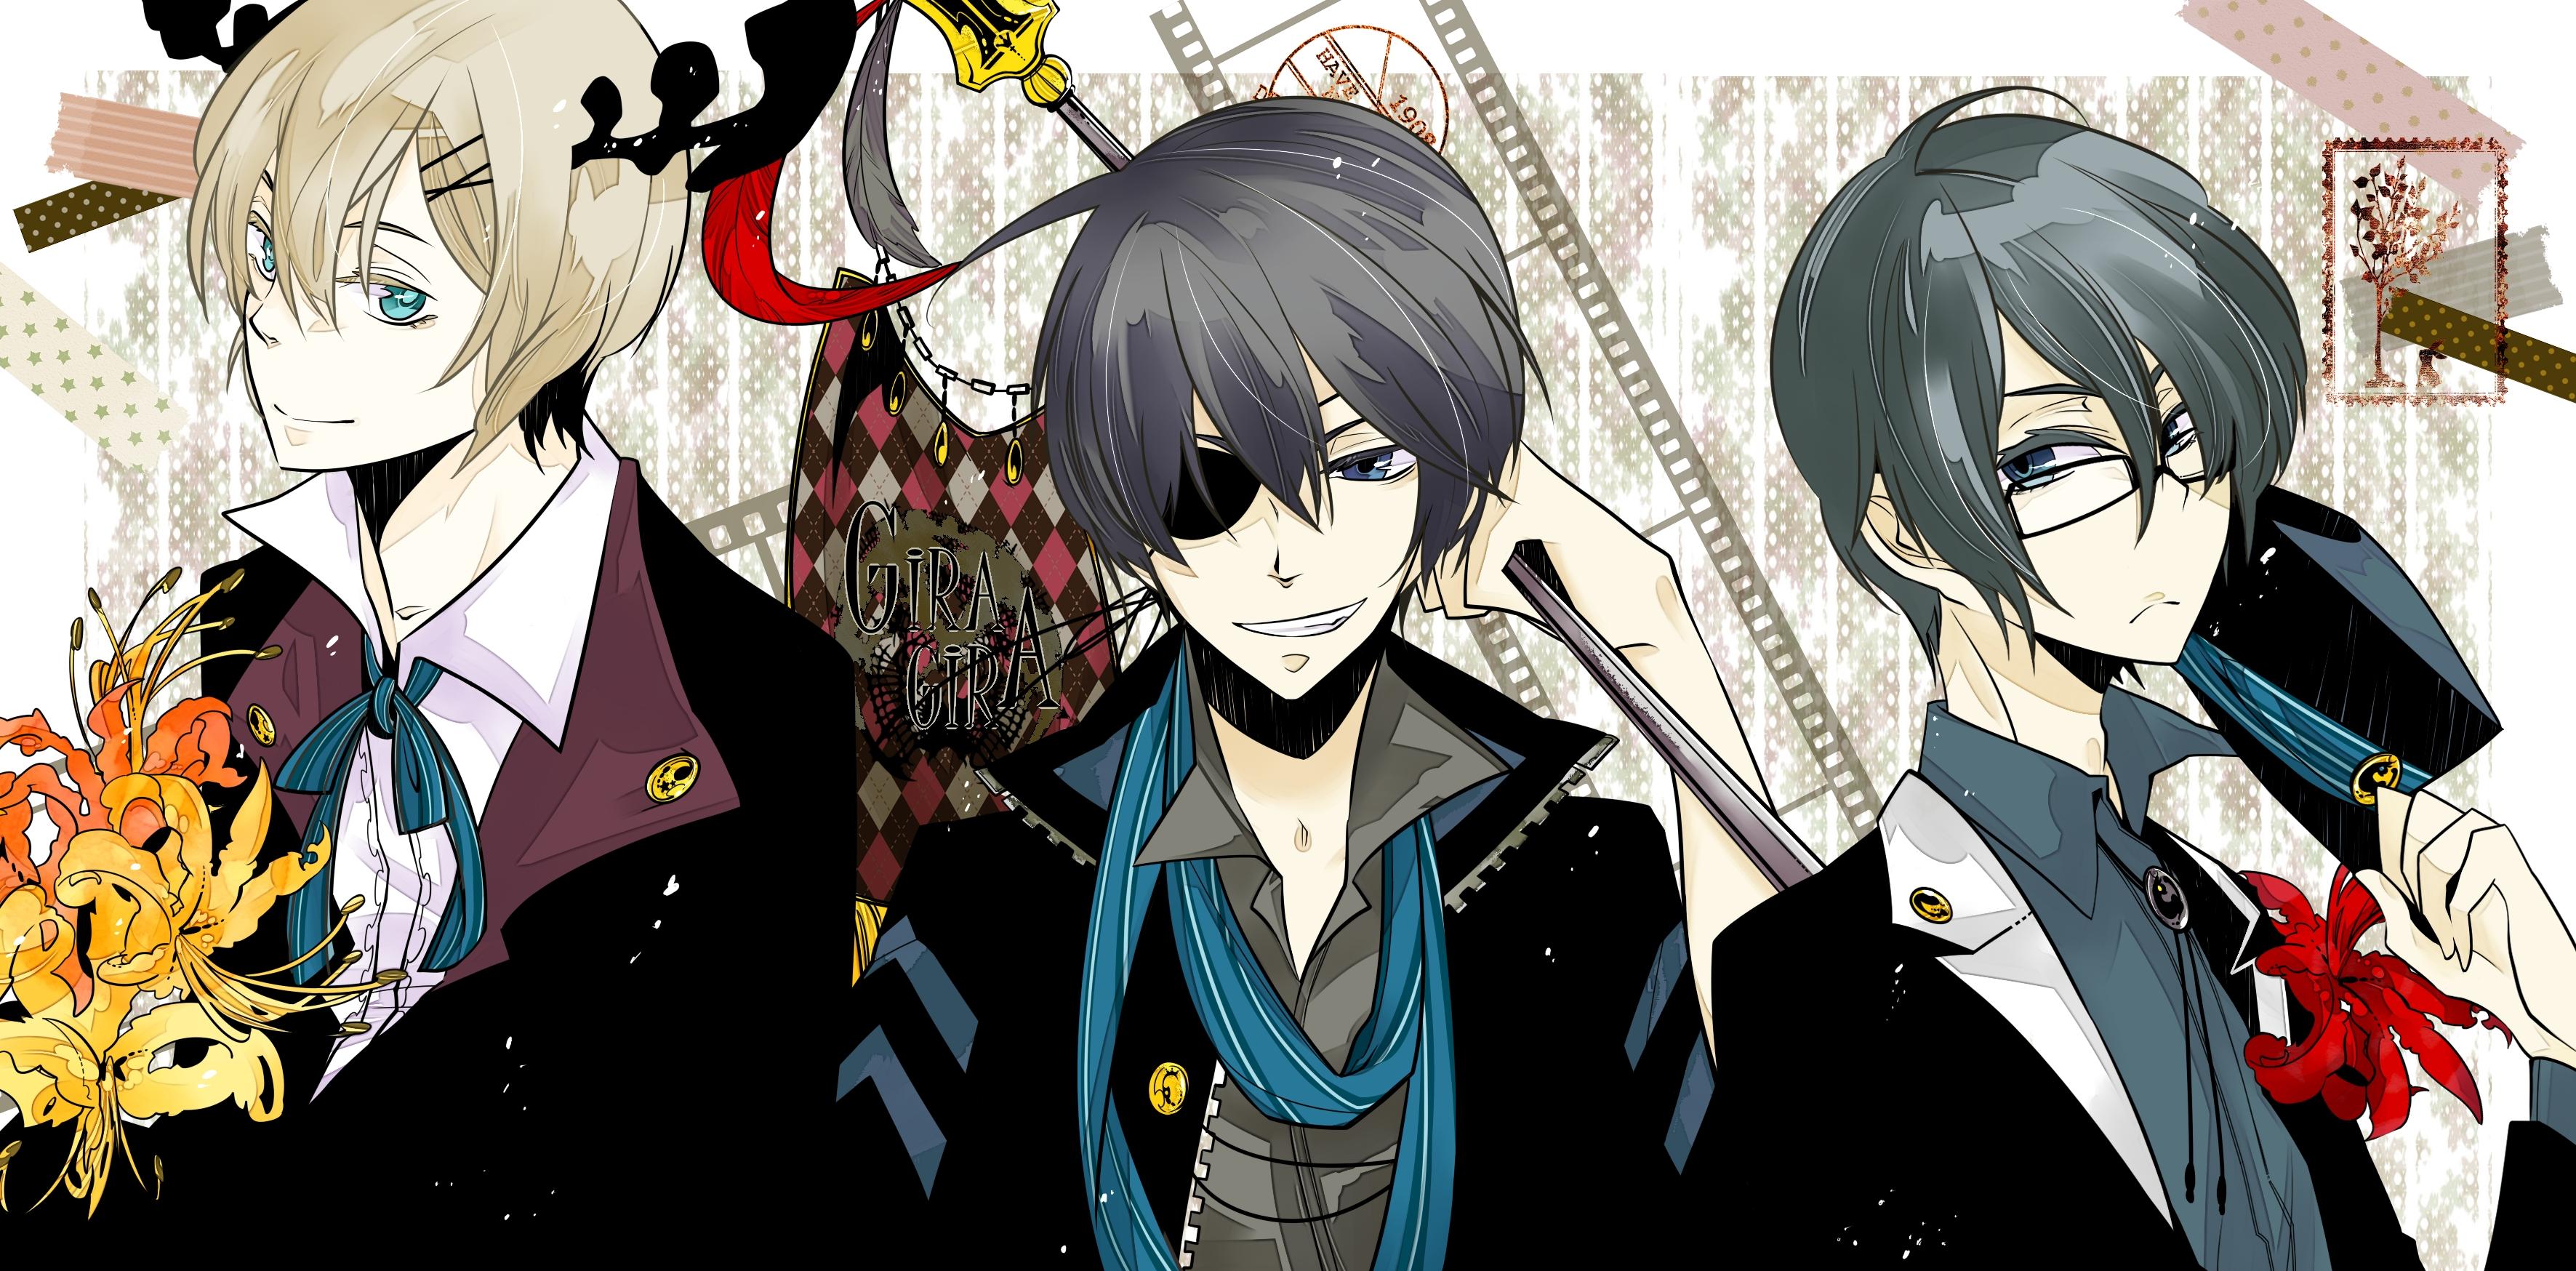 Date masamune pop 39 n music zerochan anime image board - Anime backgrounds com ...